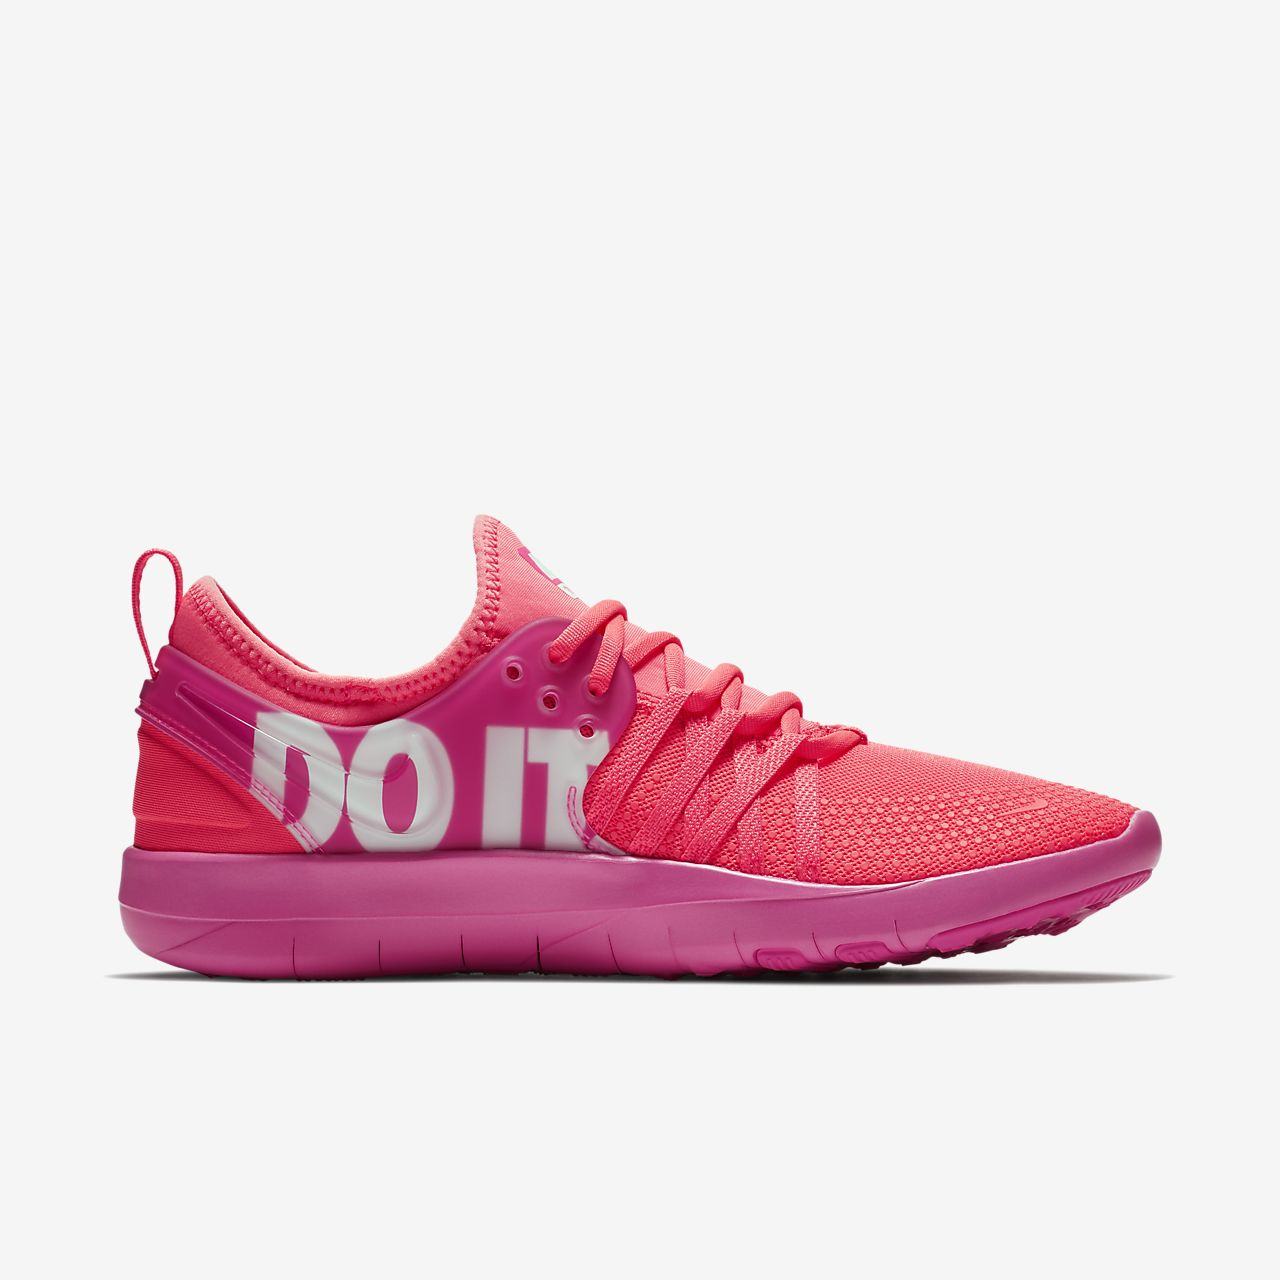 ... Nike Free Trainer 7 Premium Women's Bodyweight Training, Workout Shoe